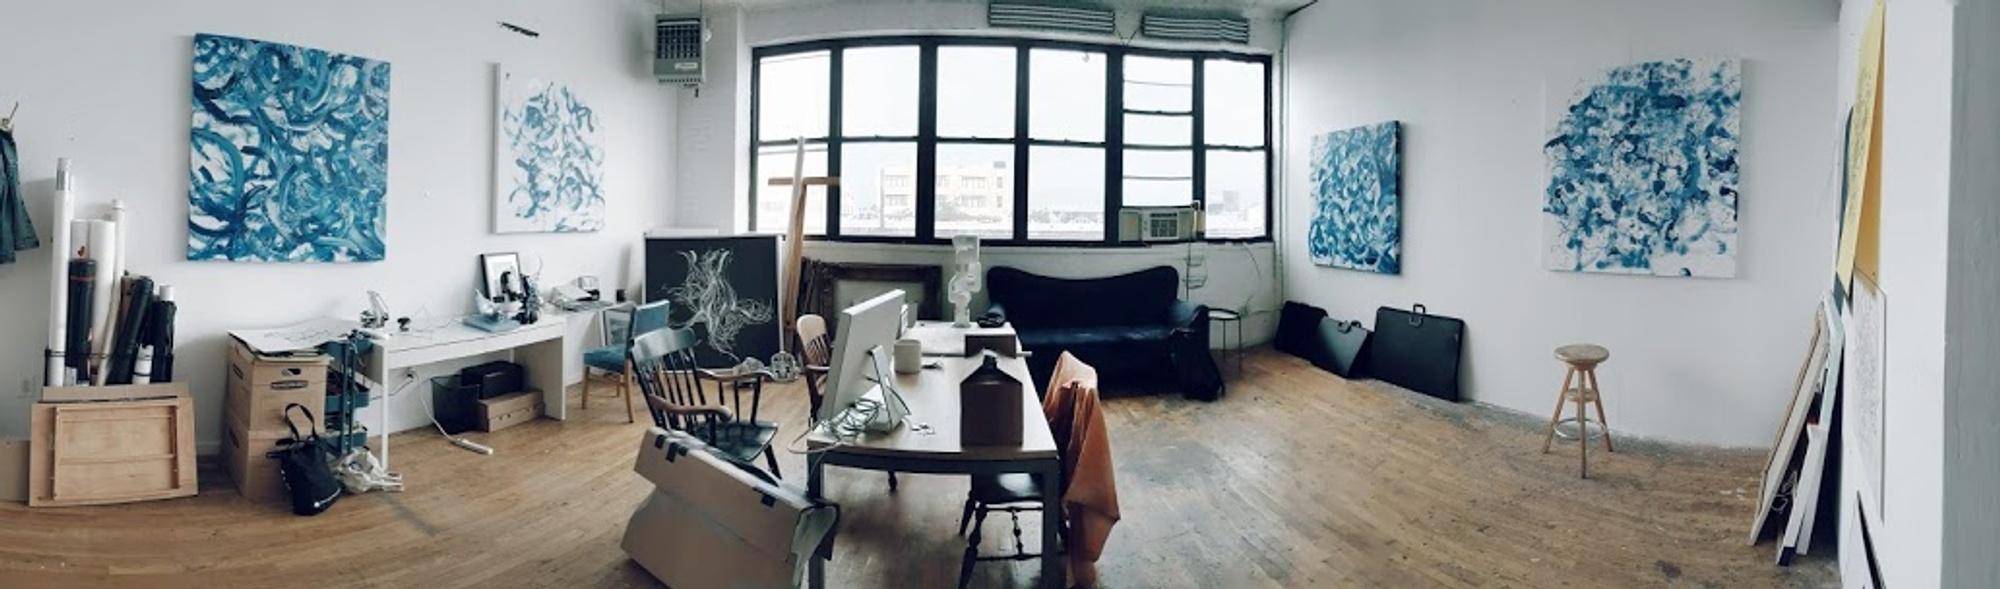 Sougwen-Chung-TCI-Studio.jpg